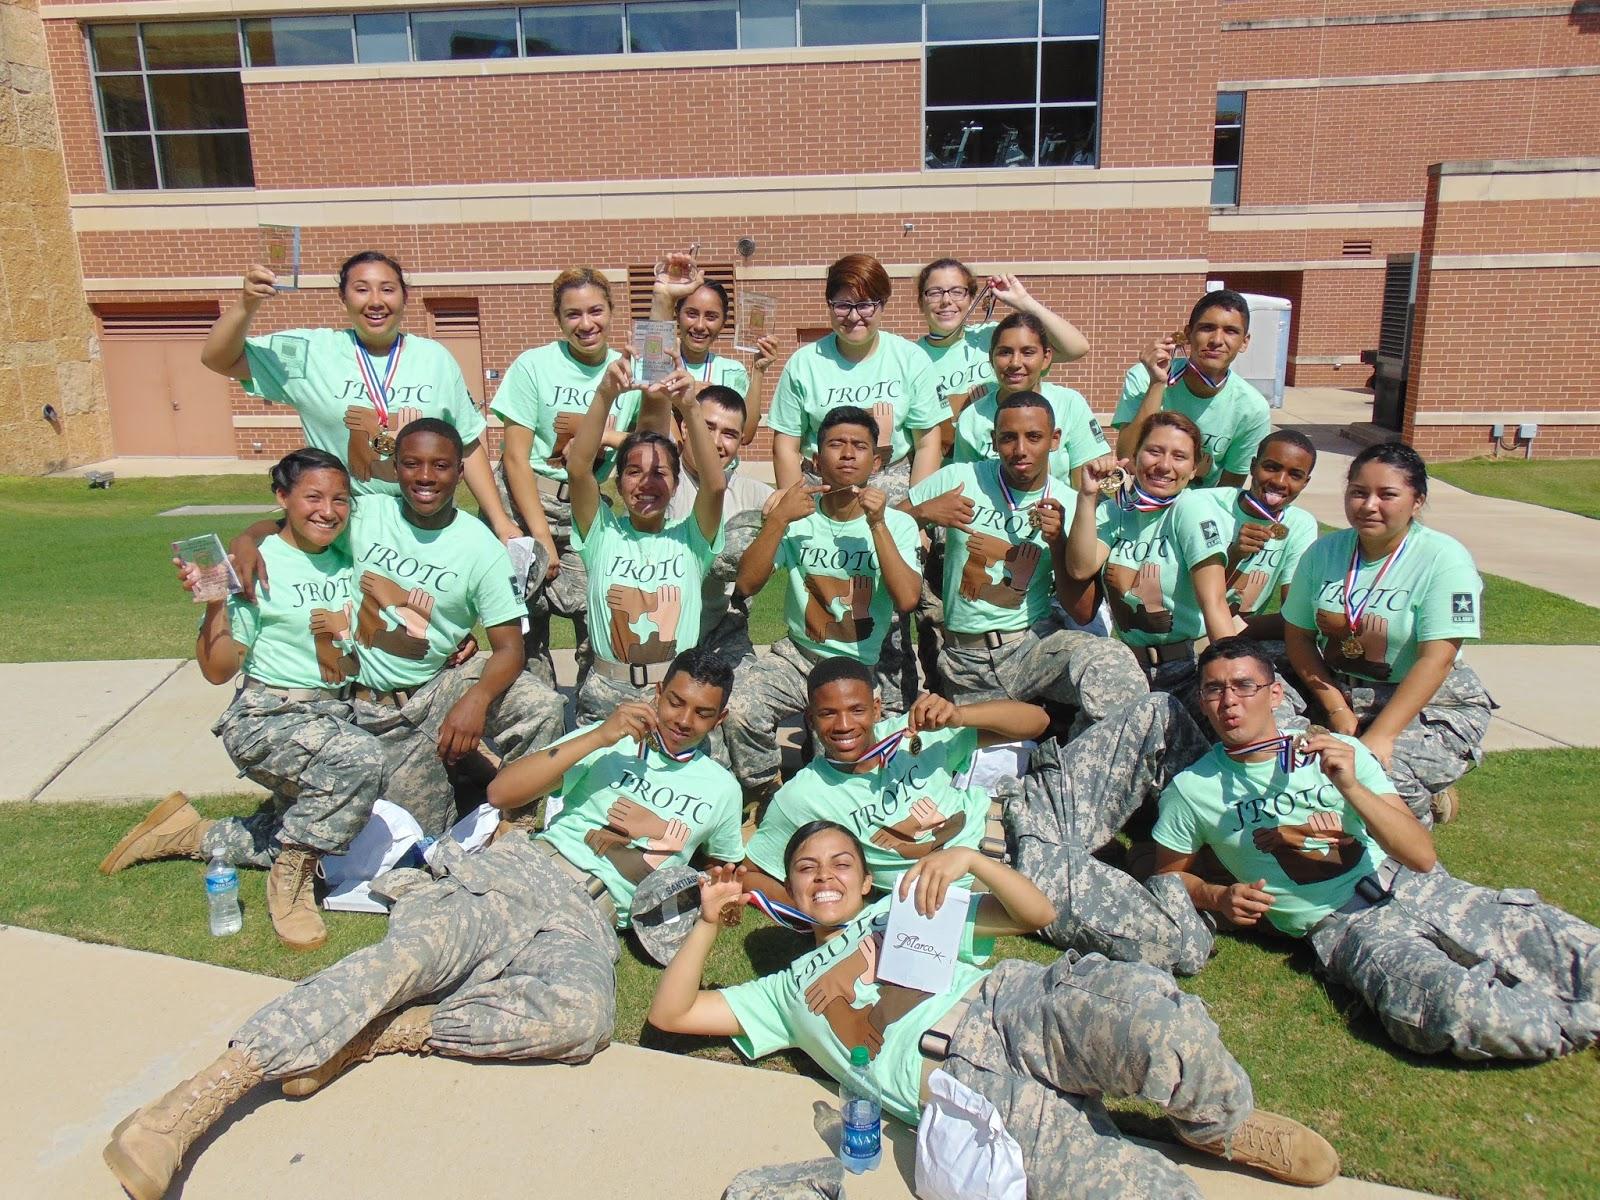 JROTC Jclc 2015